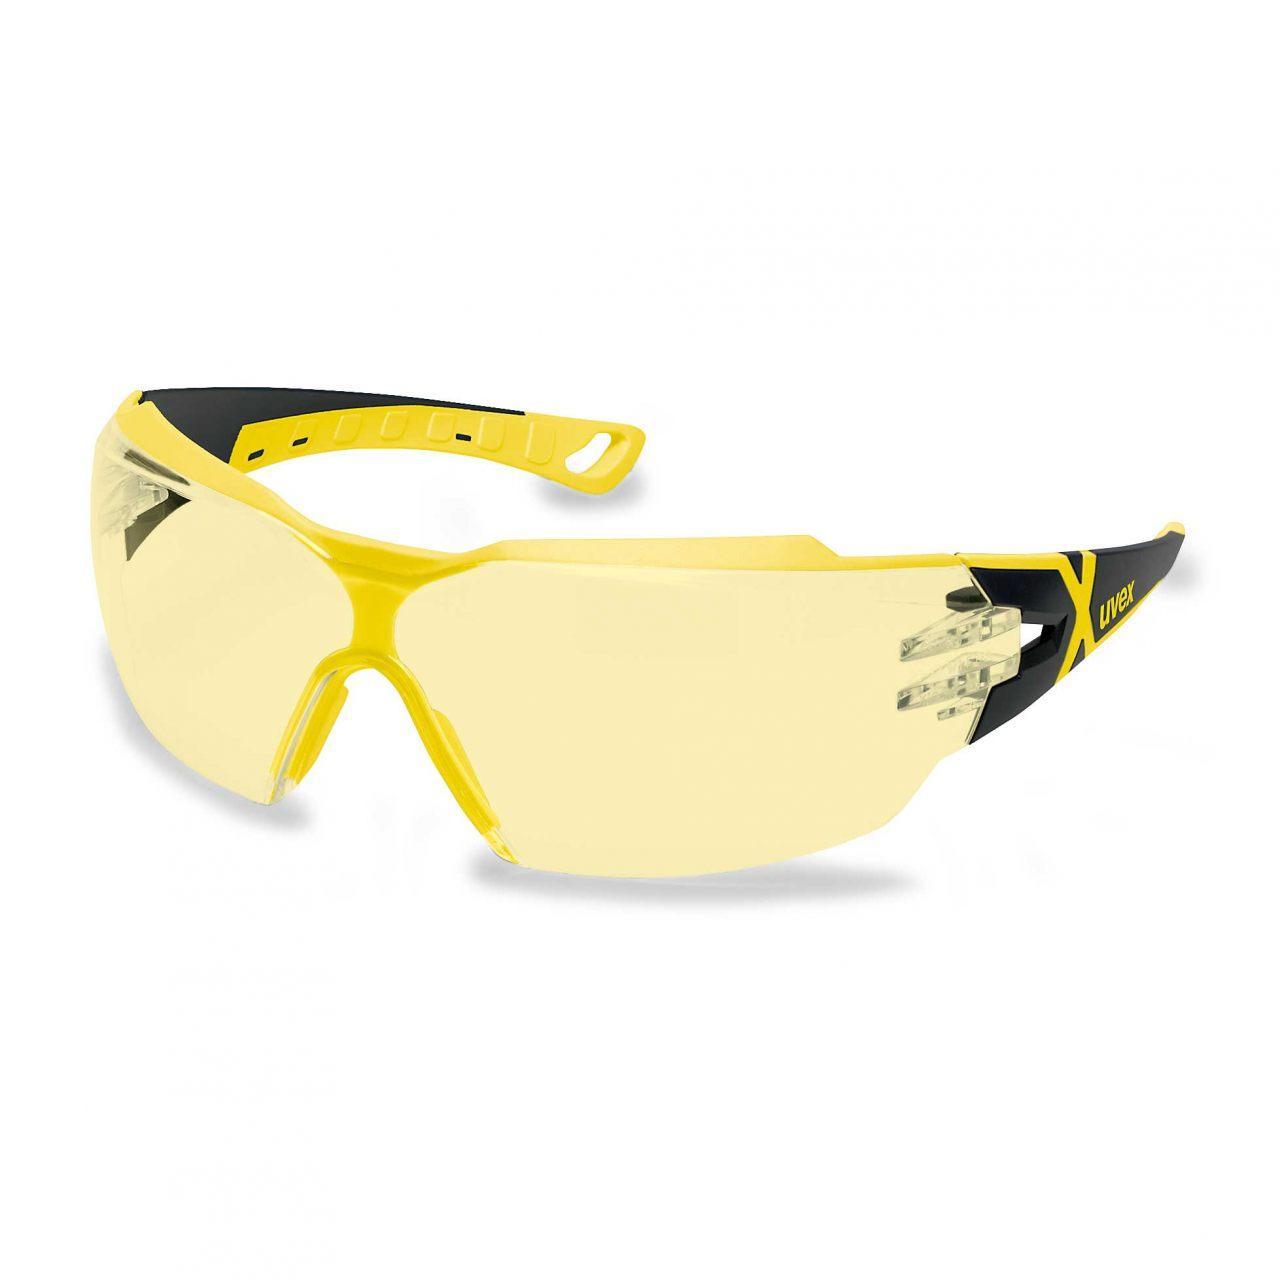 Uvex Pheos CX2 Safety Glasses Amber